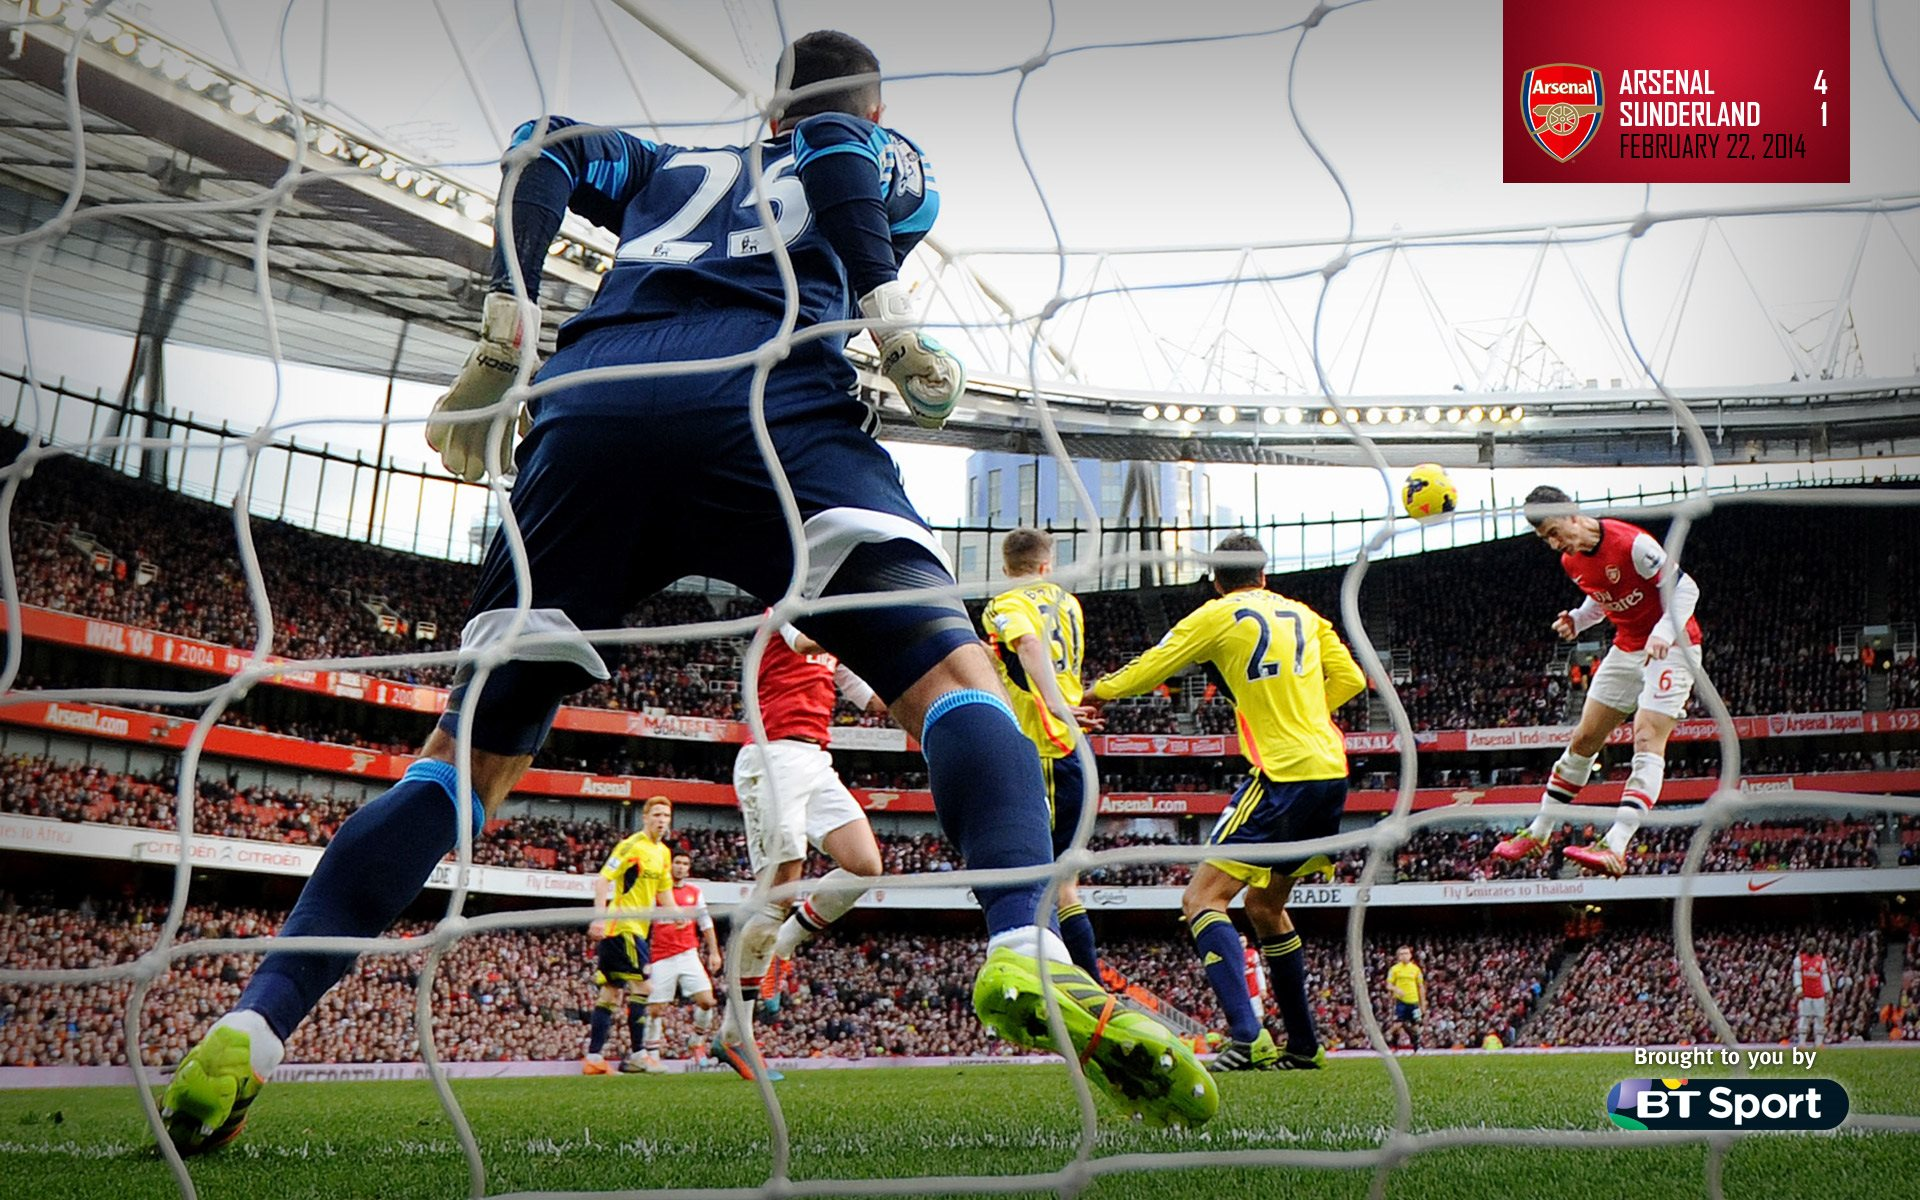 Arsenal Wallpaper 4k